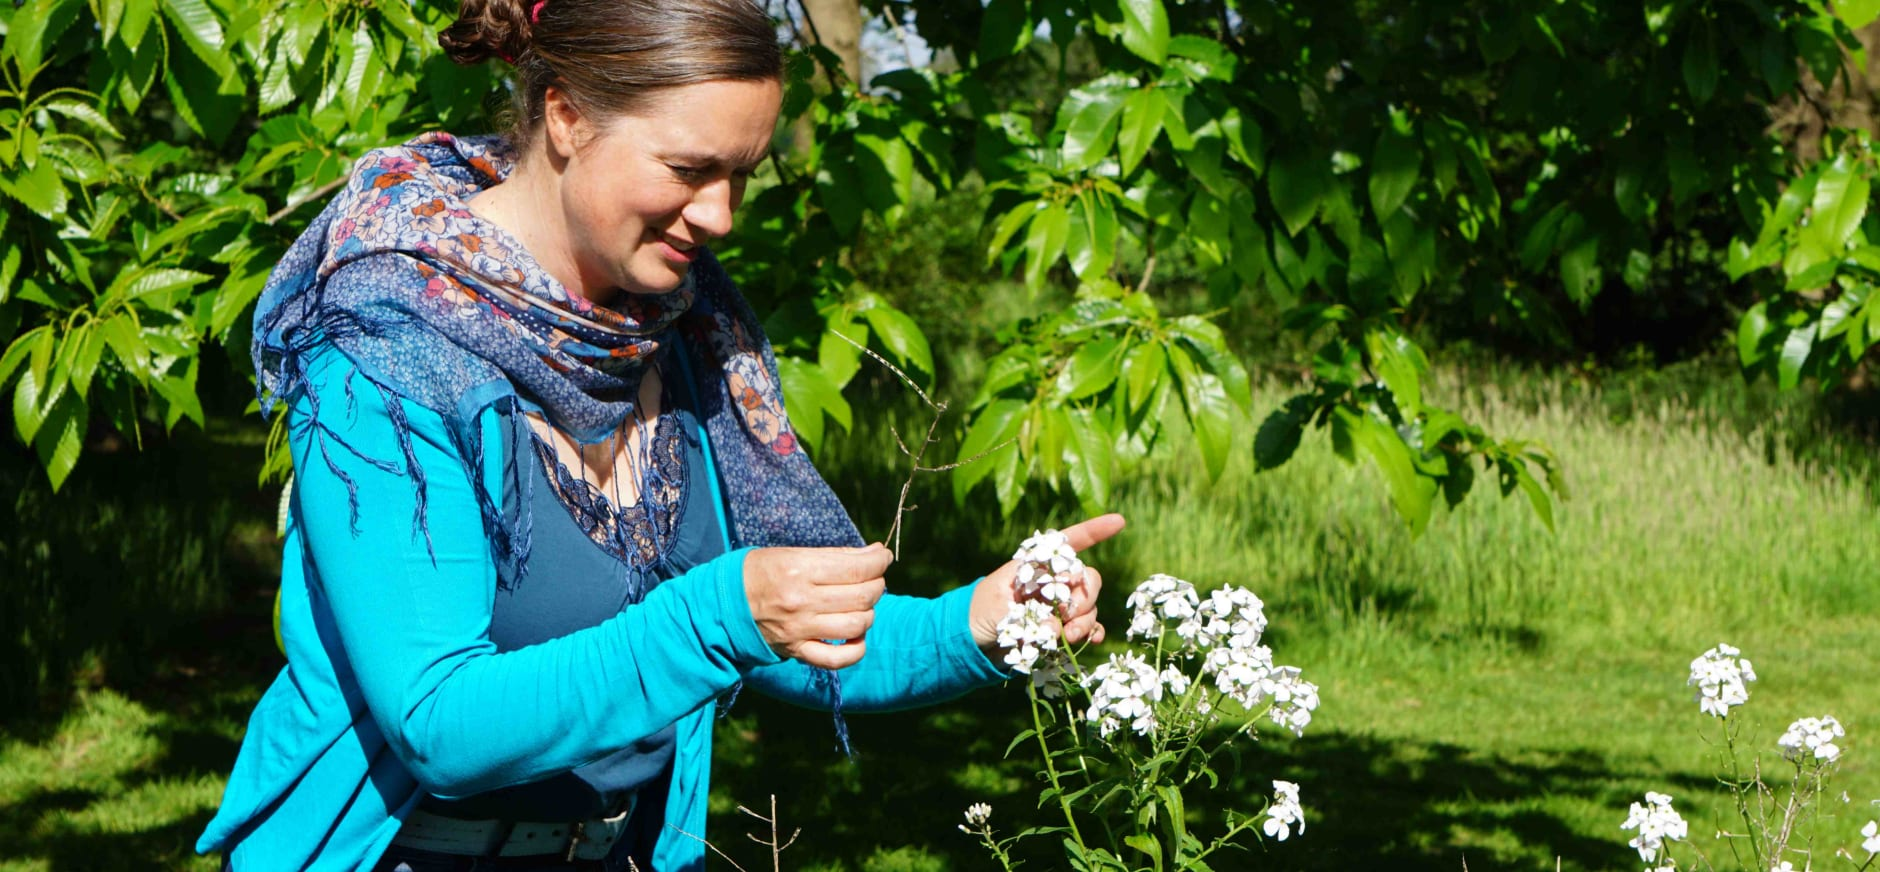 Tuinieren met Sanne